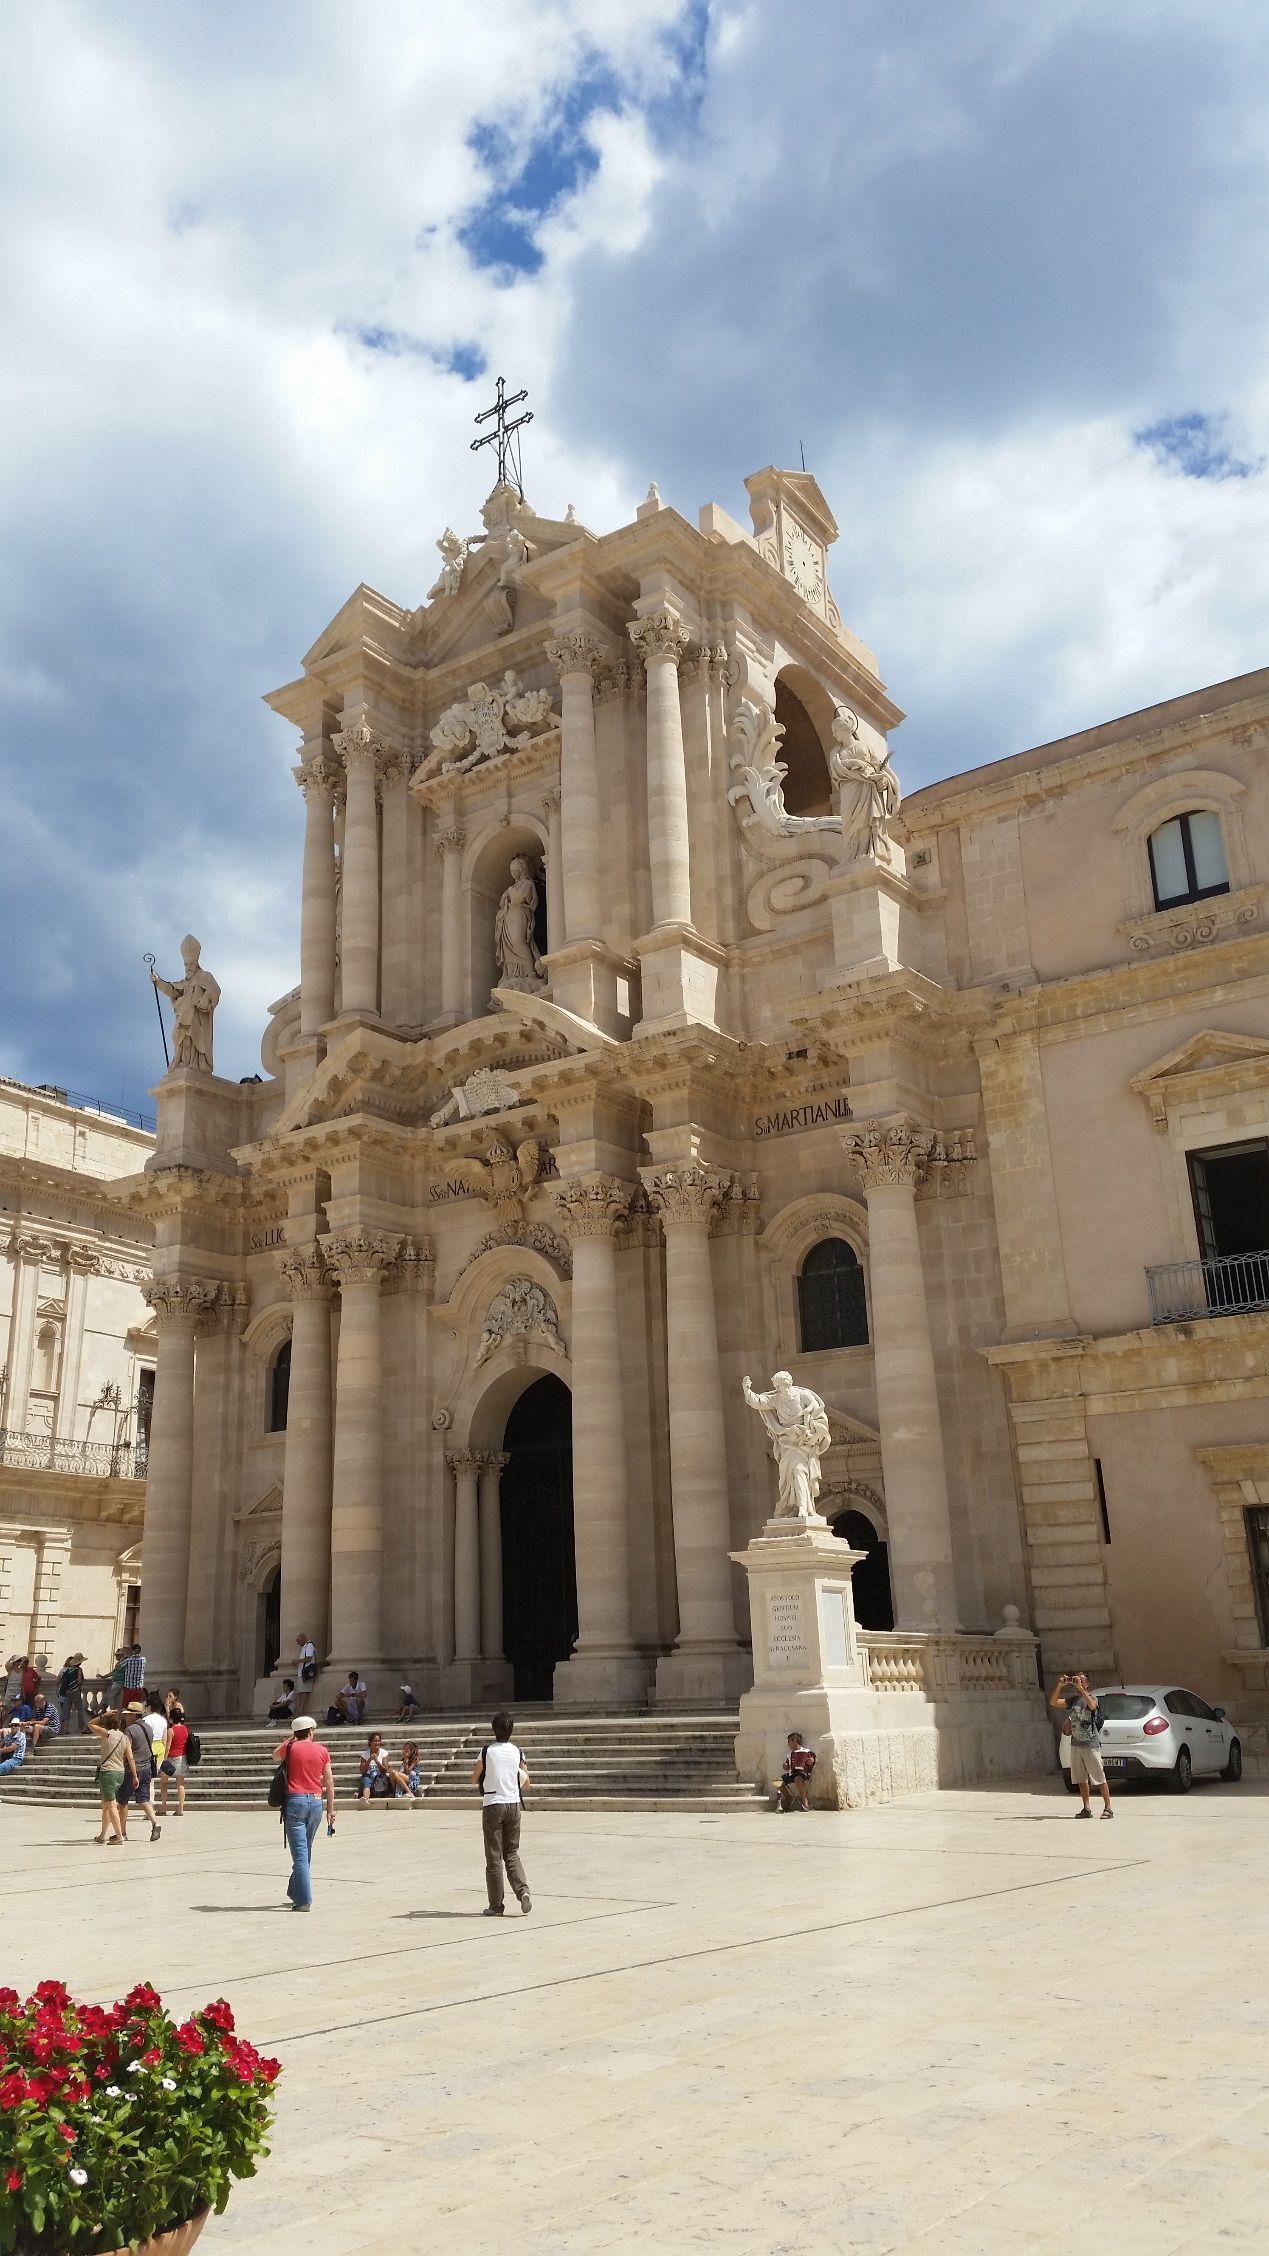 Duomo of Siracusa